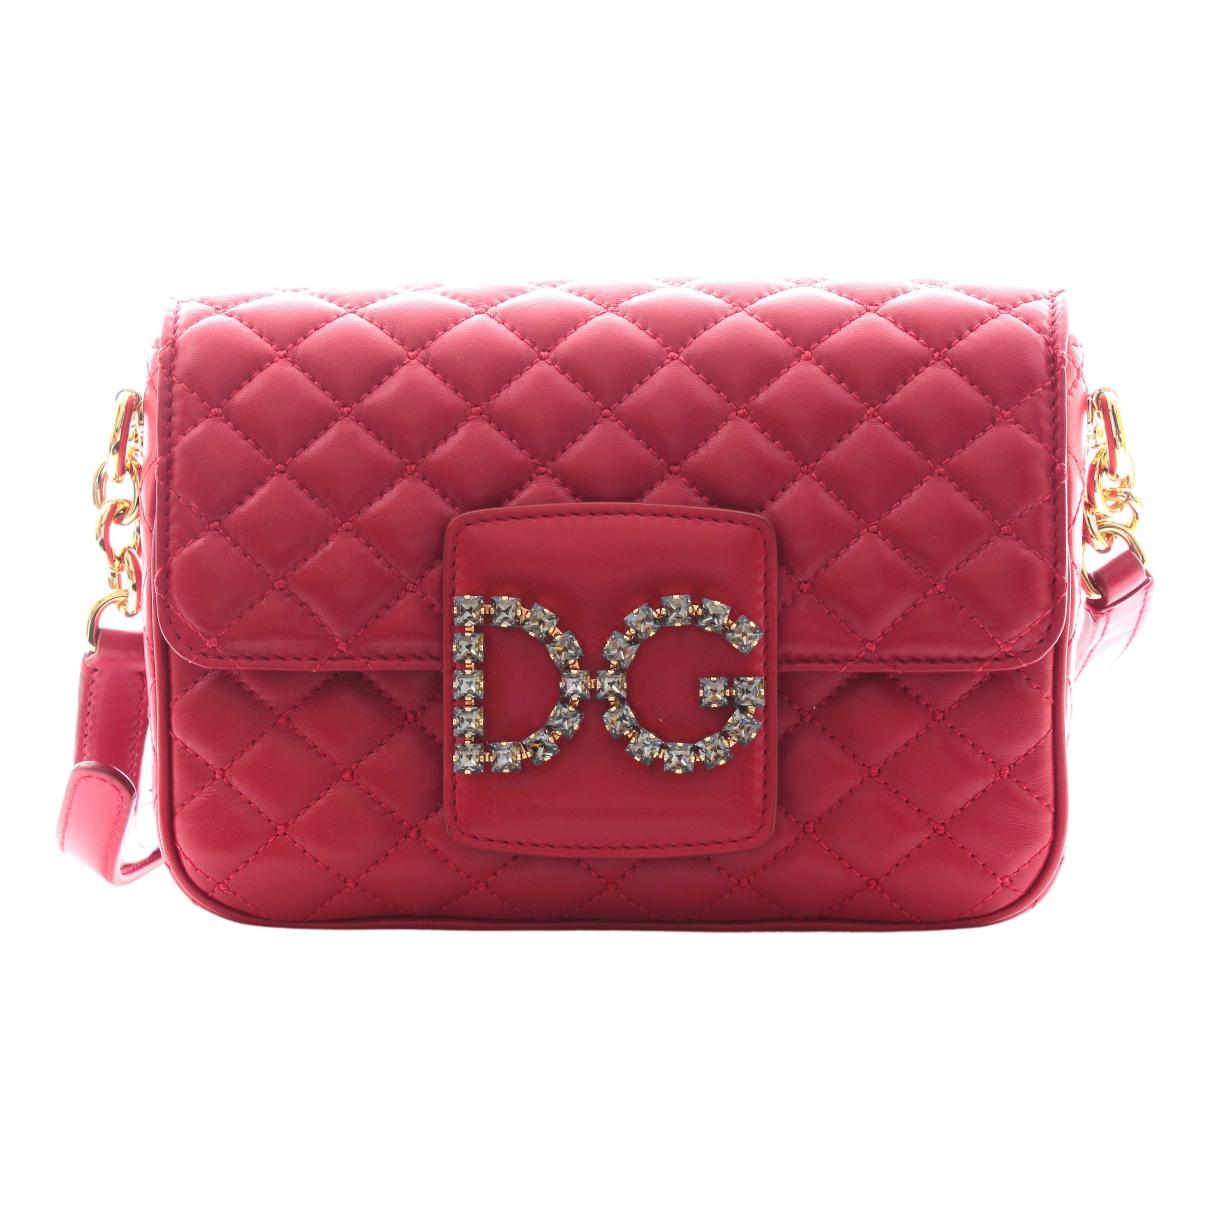 Dolce & Gabbana Millenials Handtasche in  Rot Leder